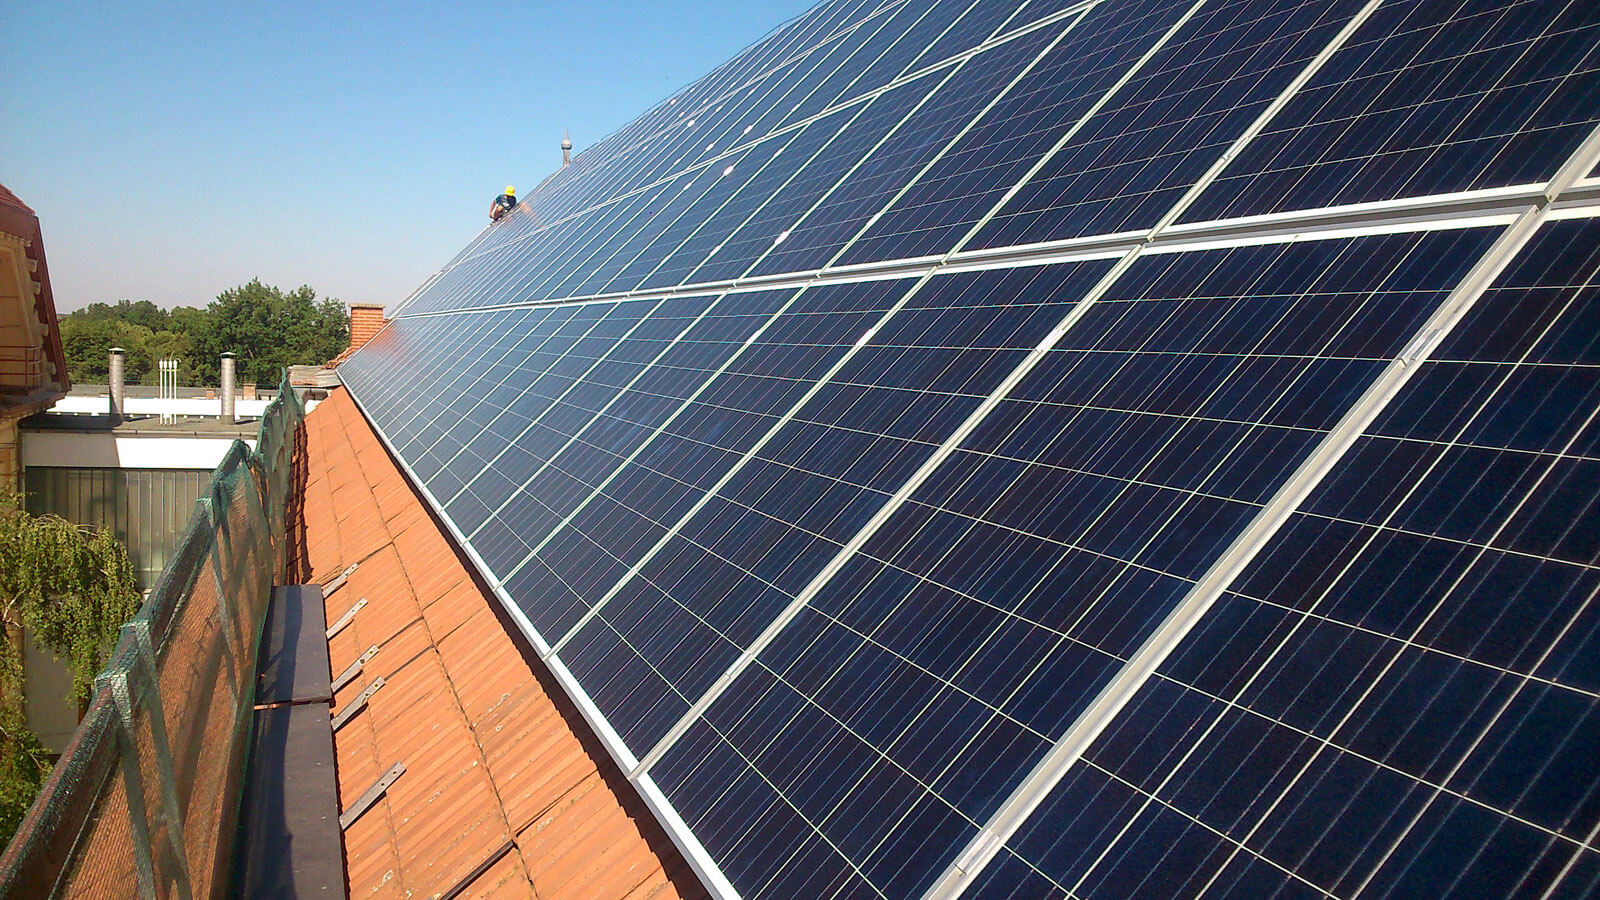 bekes-megye-napelem-rendszer-kivitelezo-forgalmazo-33kw